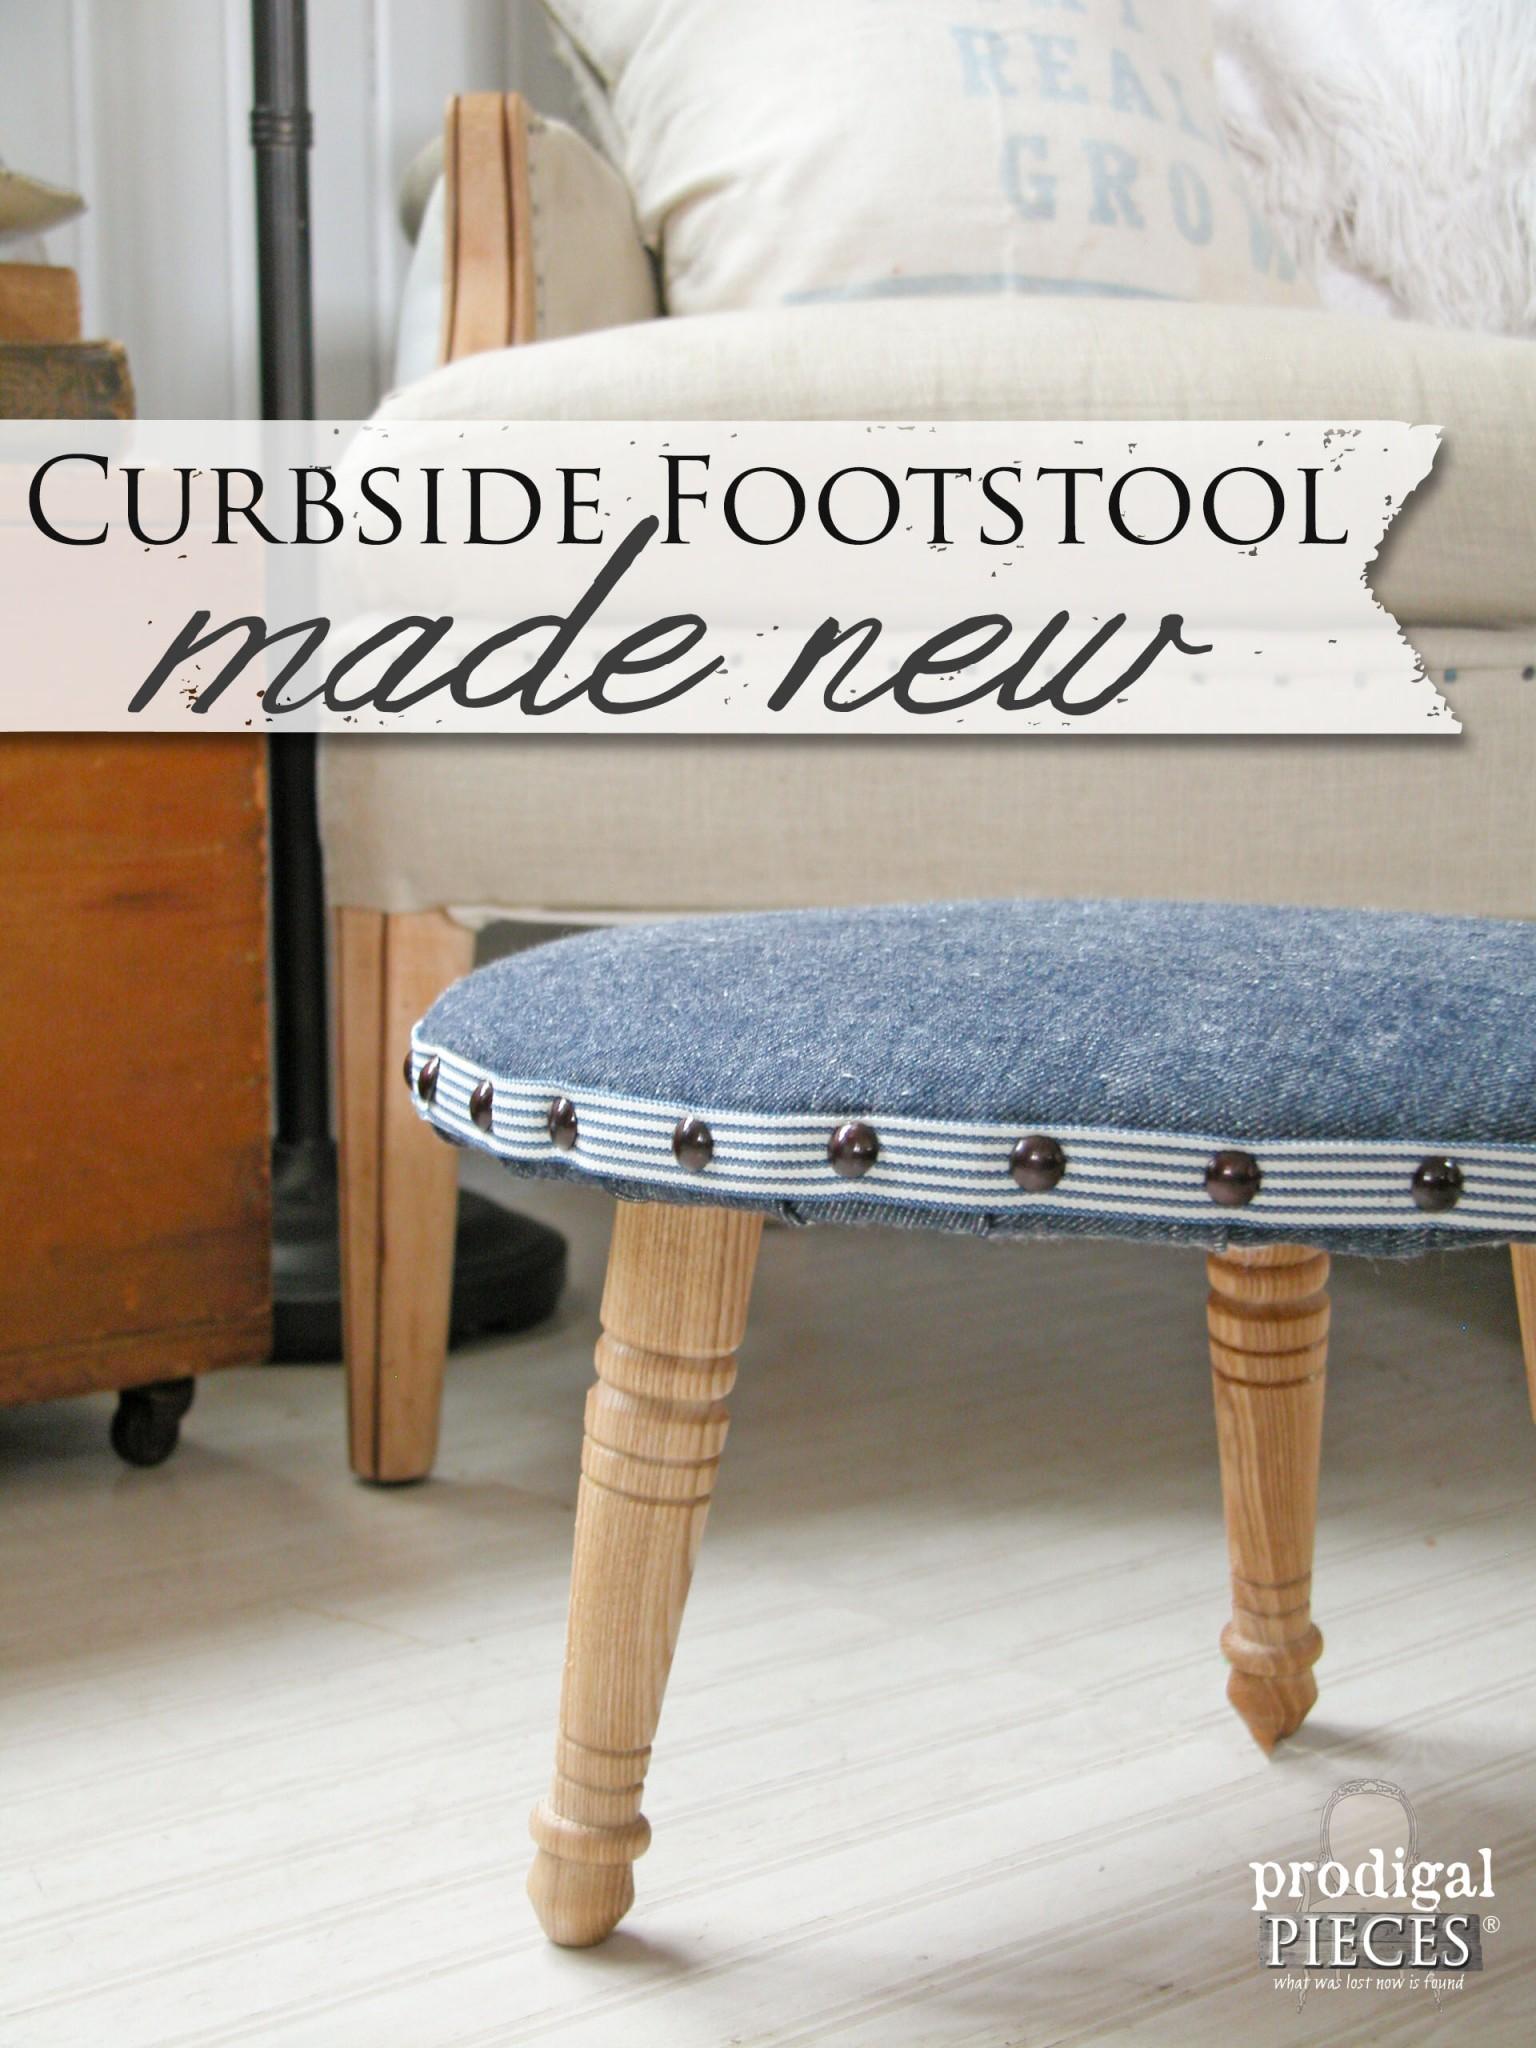 Curbside Foostool Made New